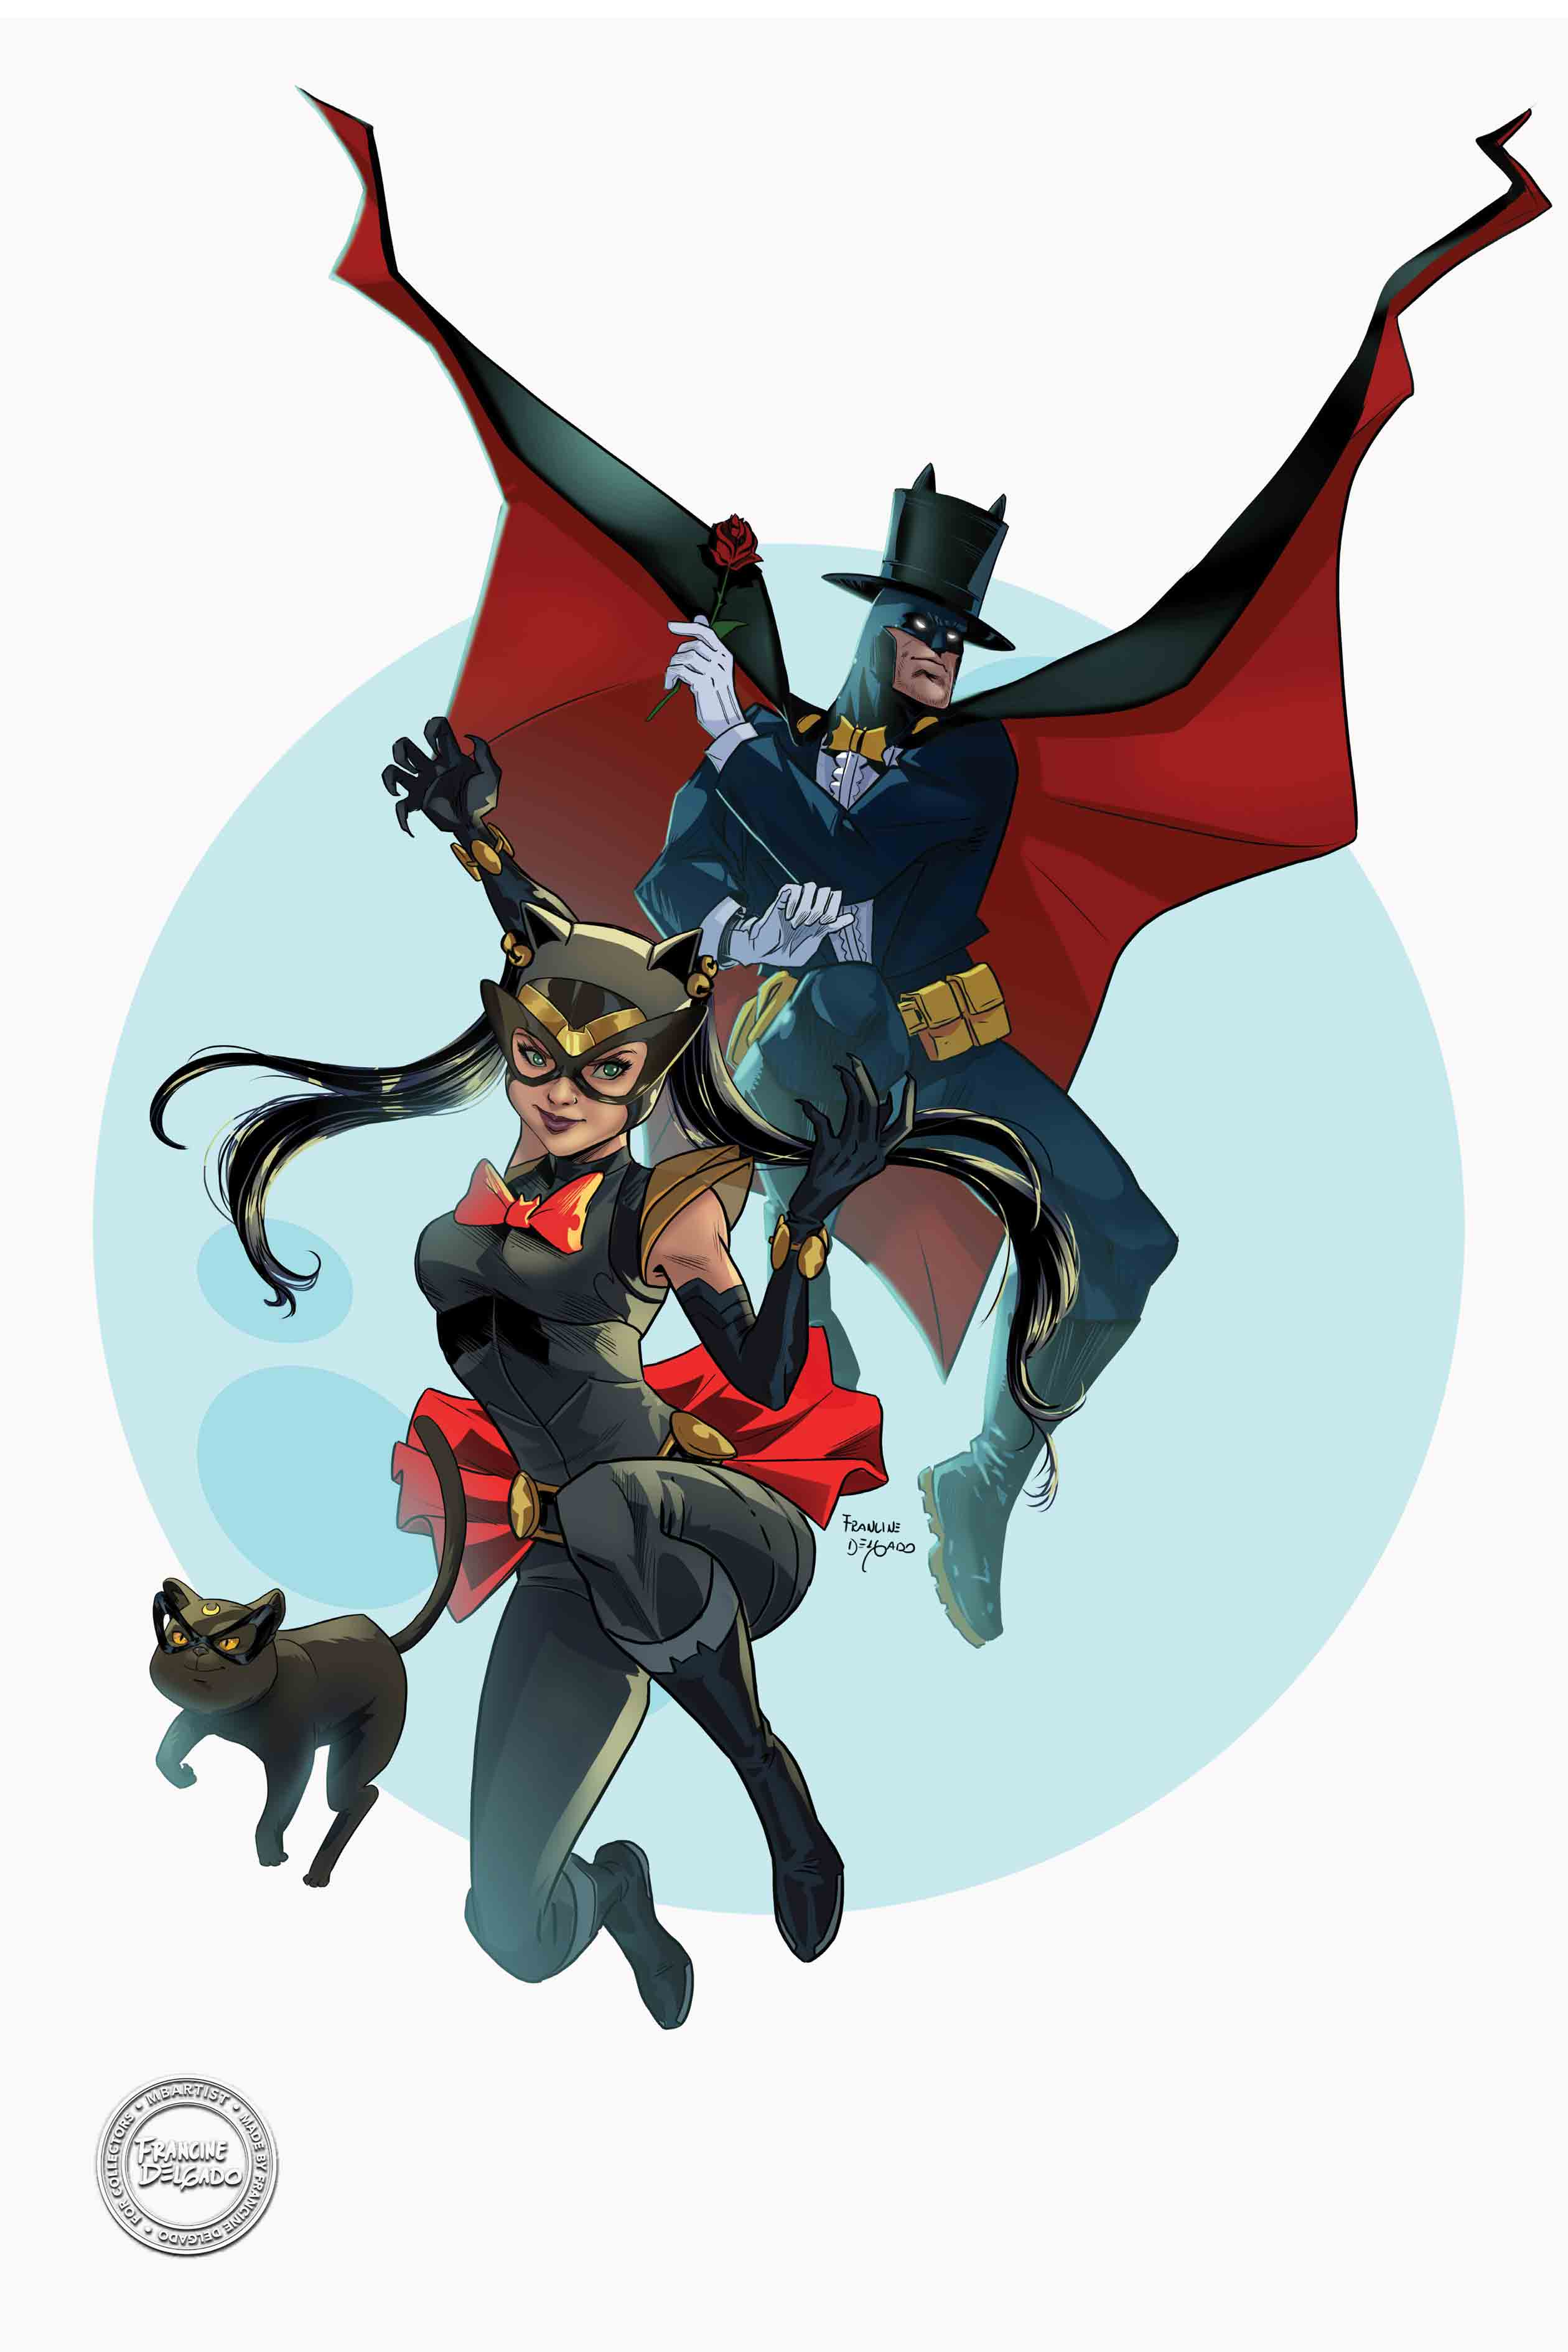 SAILOR MOON/BATMAN MASH-UP: SAILOR SELINA AND BATUXIDO